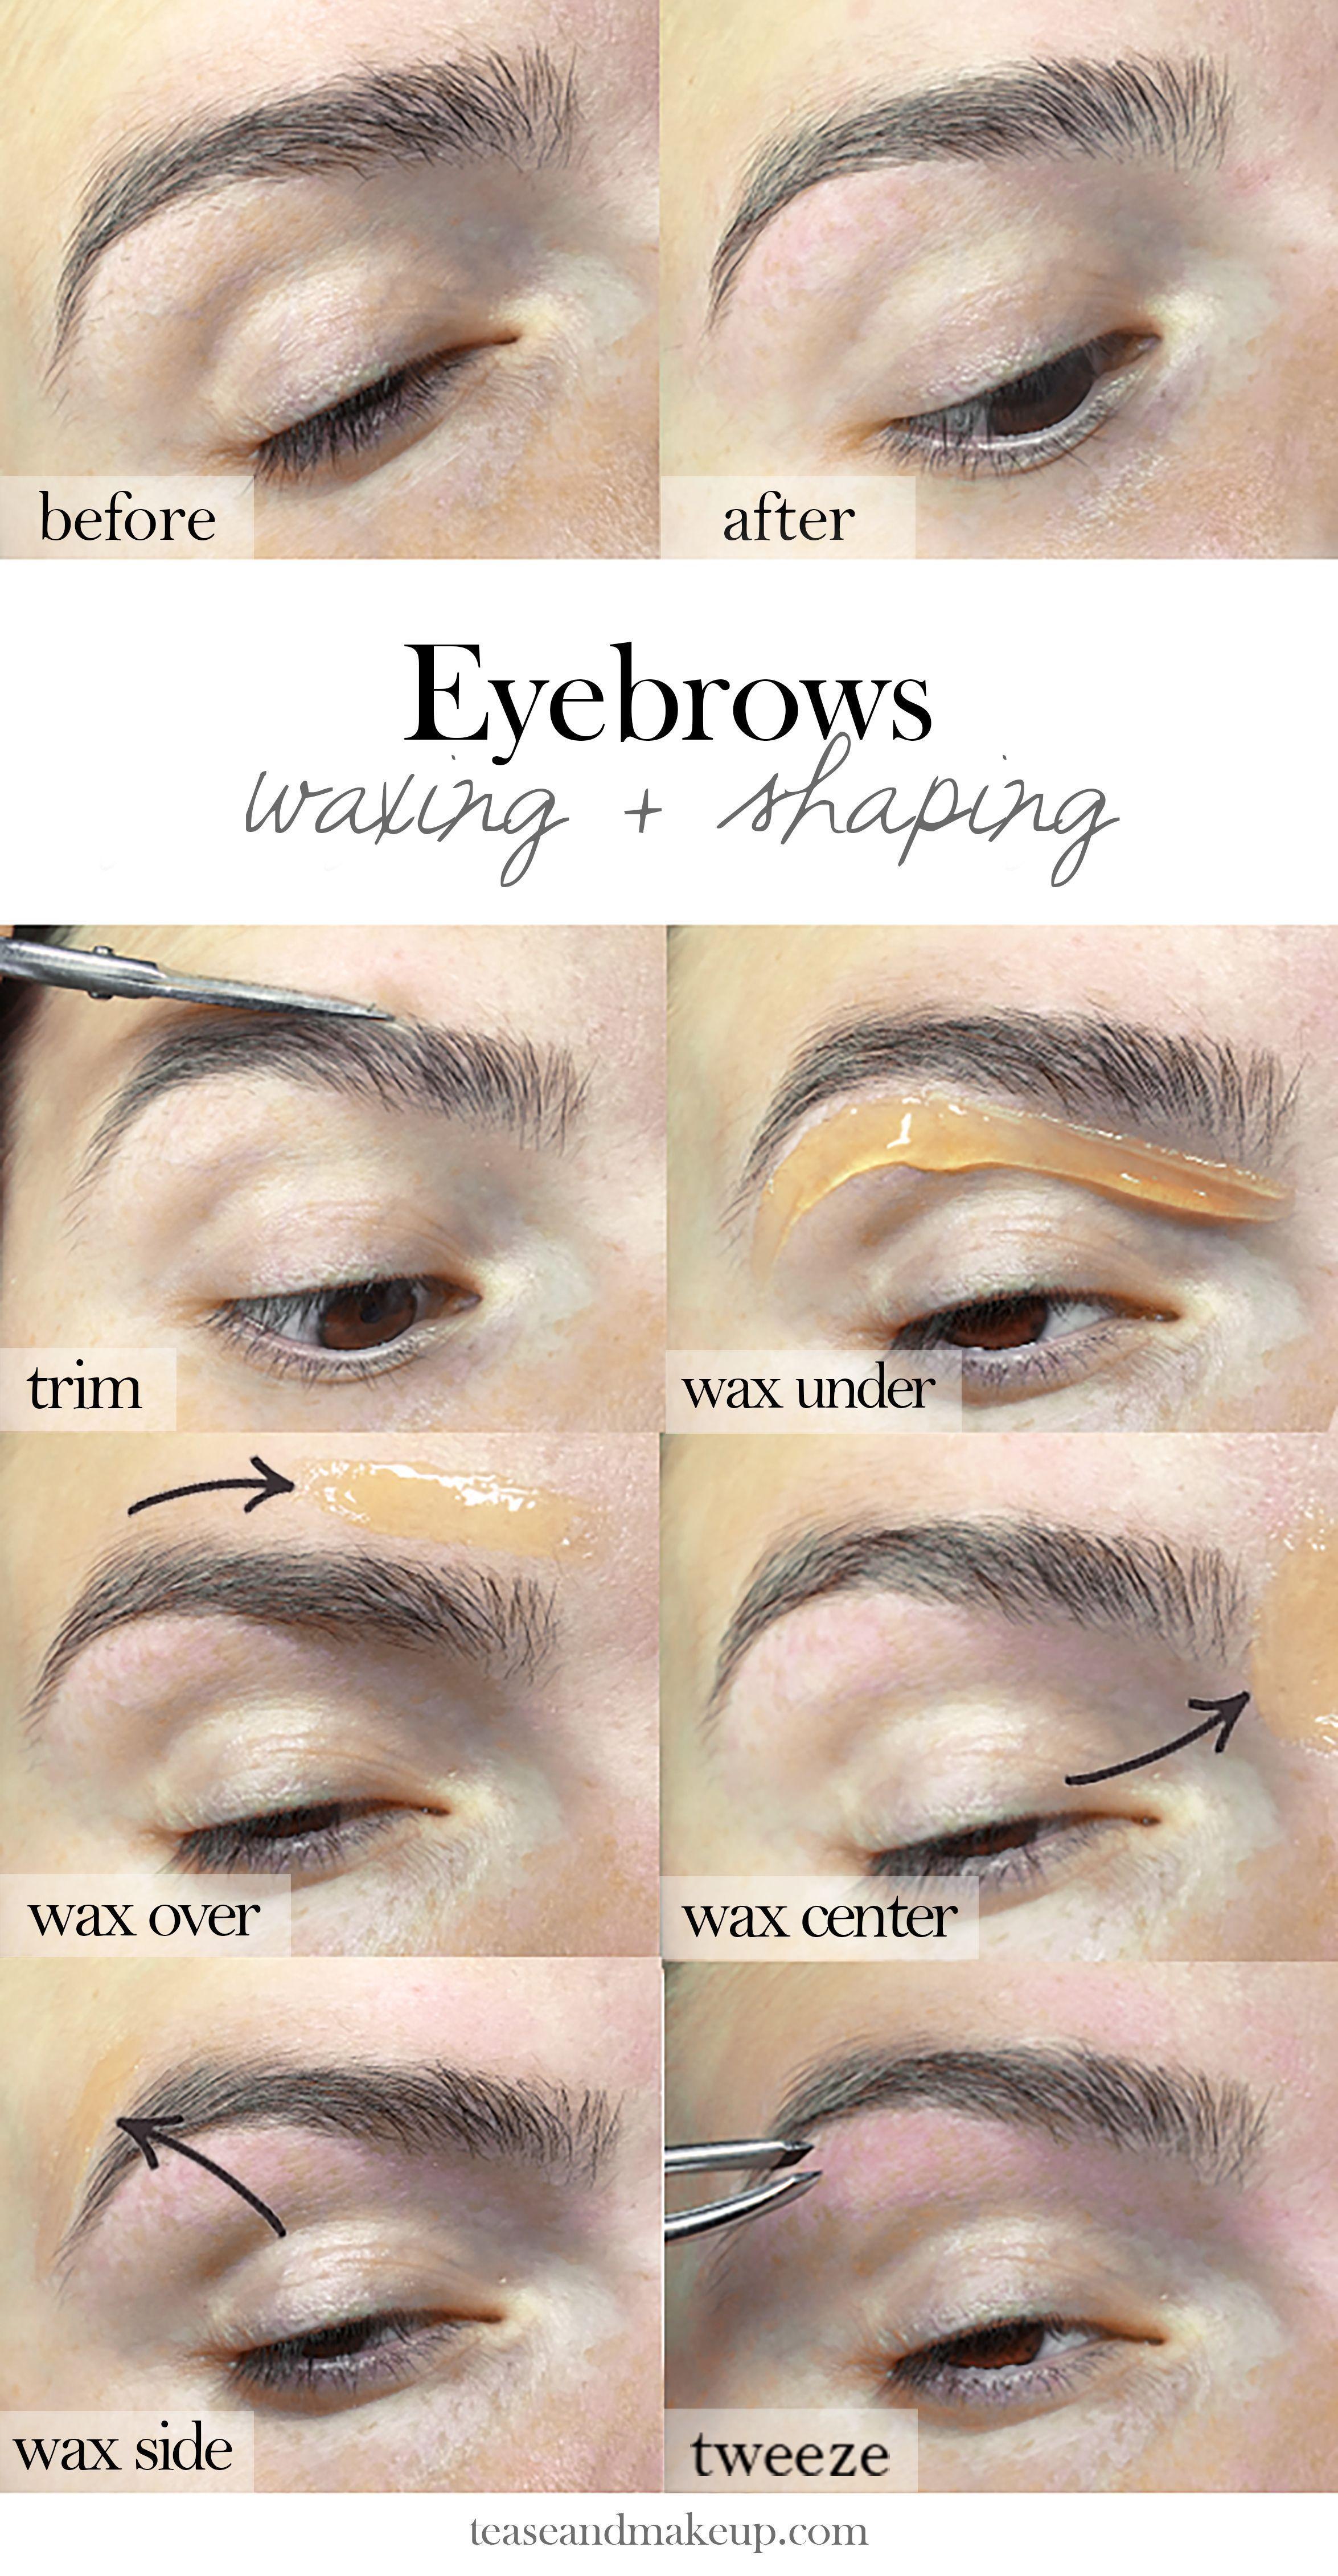 At-Home vs, Salon Eyebrow Waxing